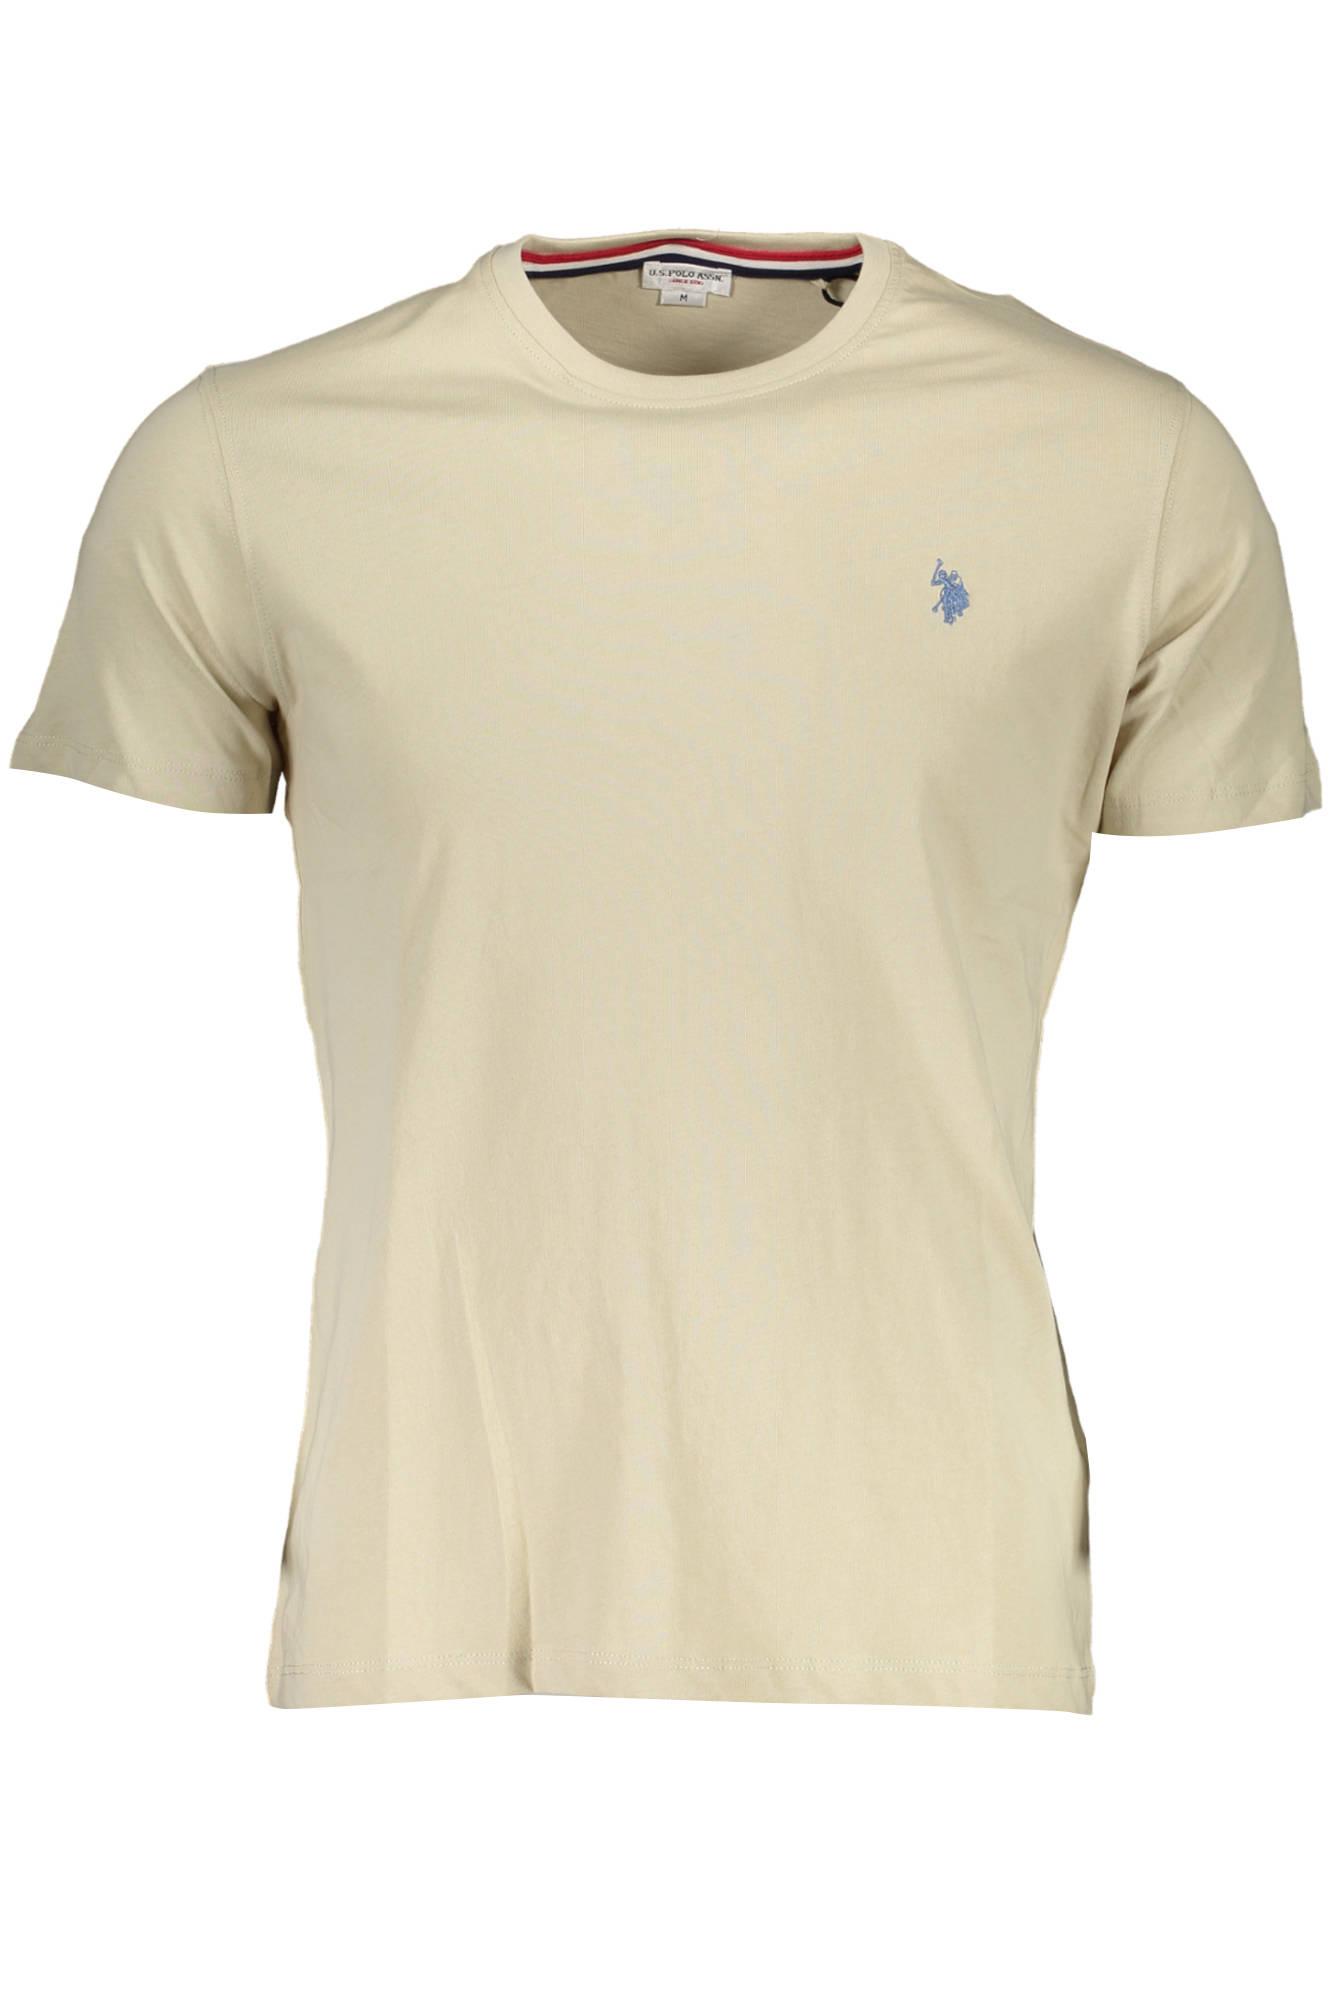 Tričko U.S. POLO tričko s krátkým rukávem BEIGE